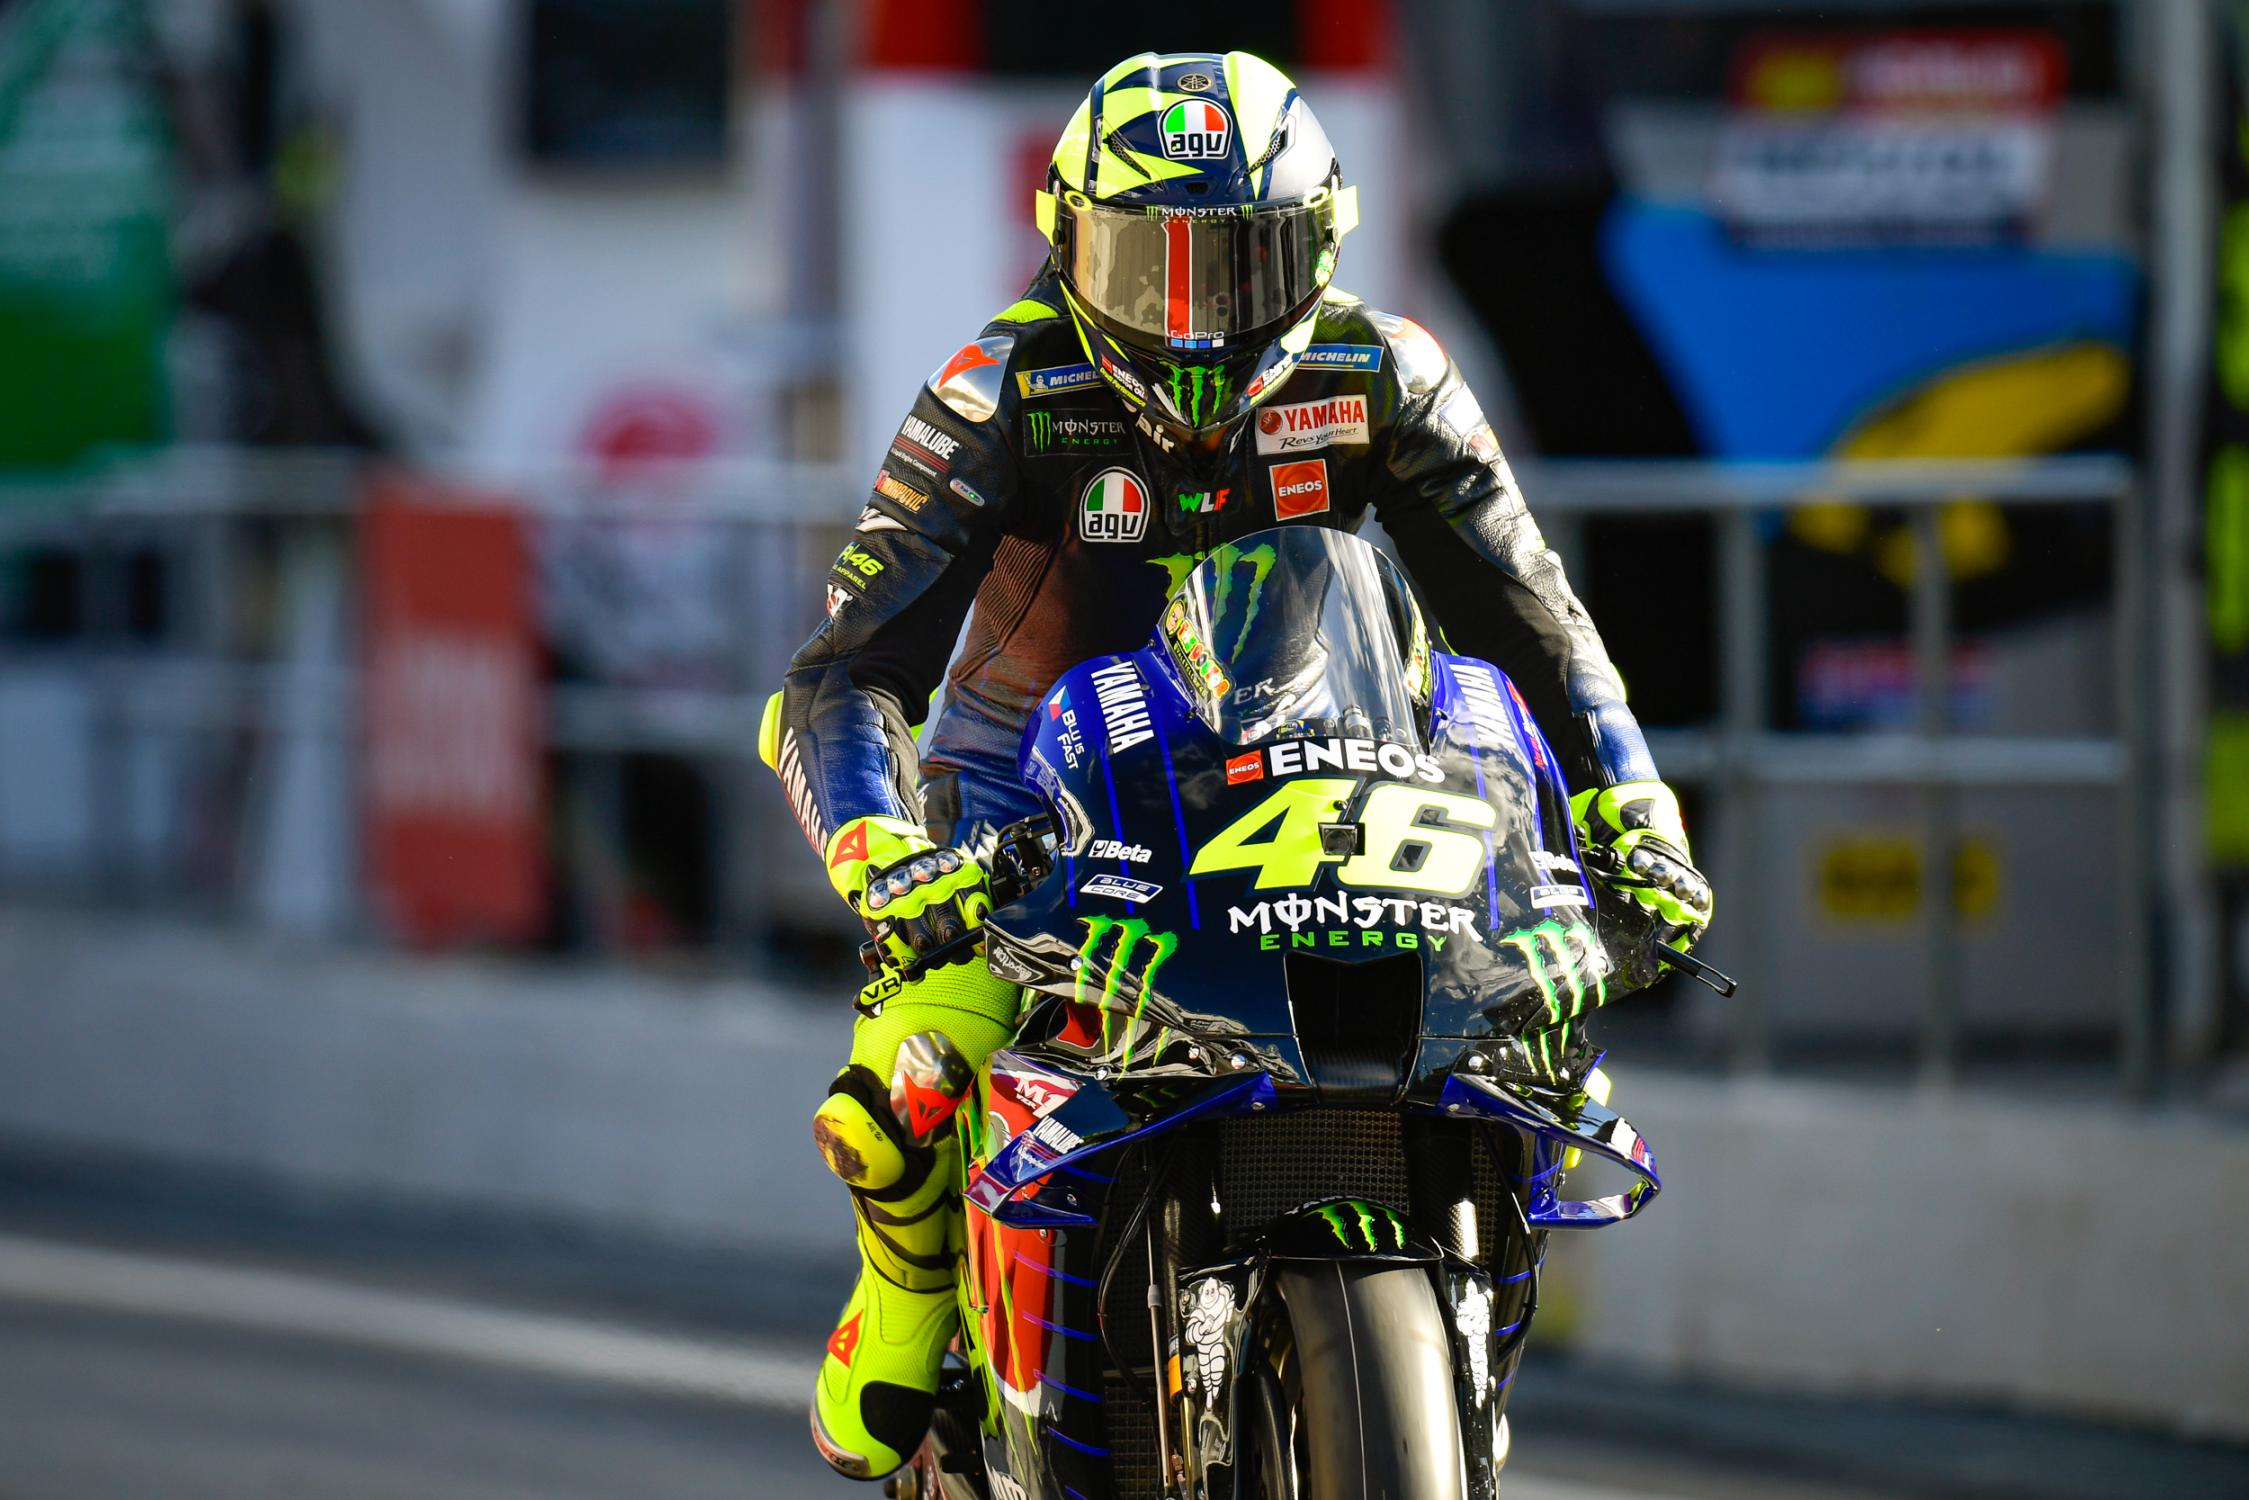 Valentino Rossi, Monster Energy Yamaha MotoGP, Circuit Barcelona Catalunya 2020